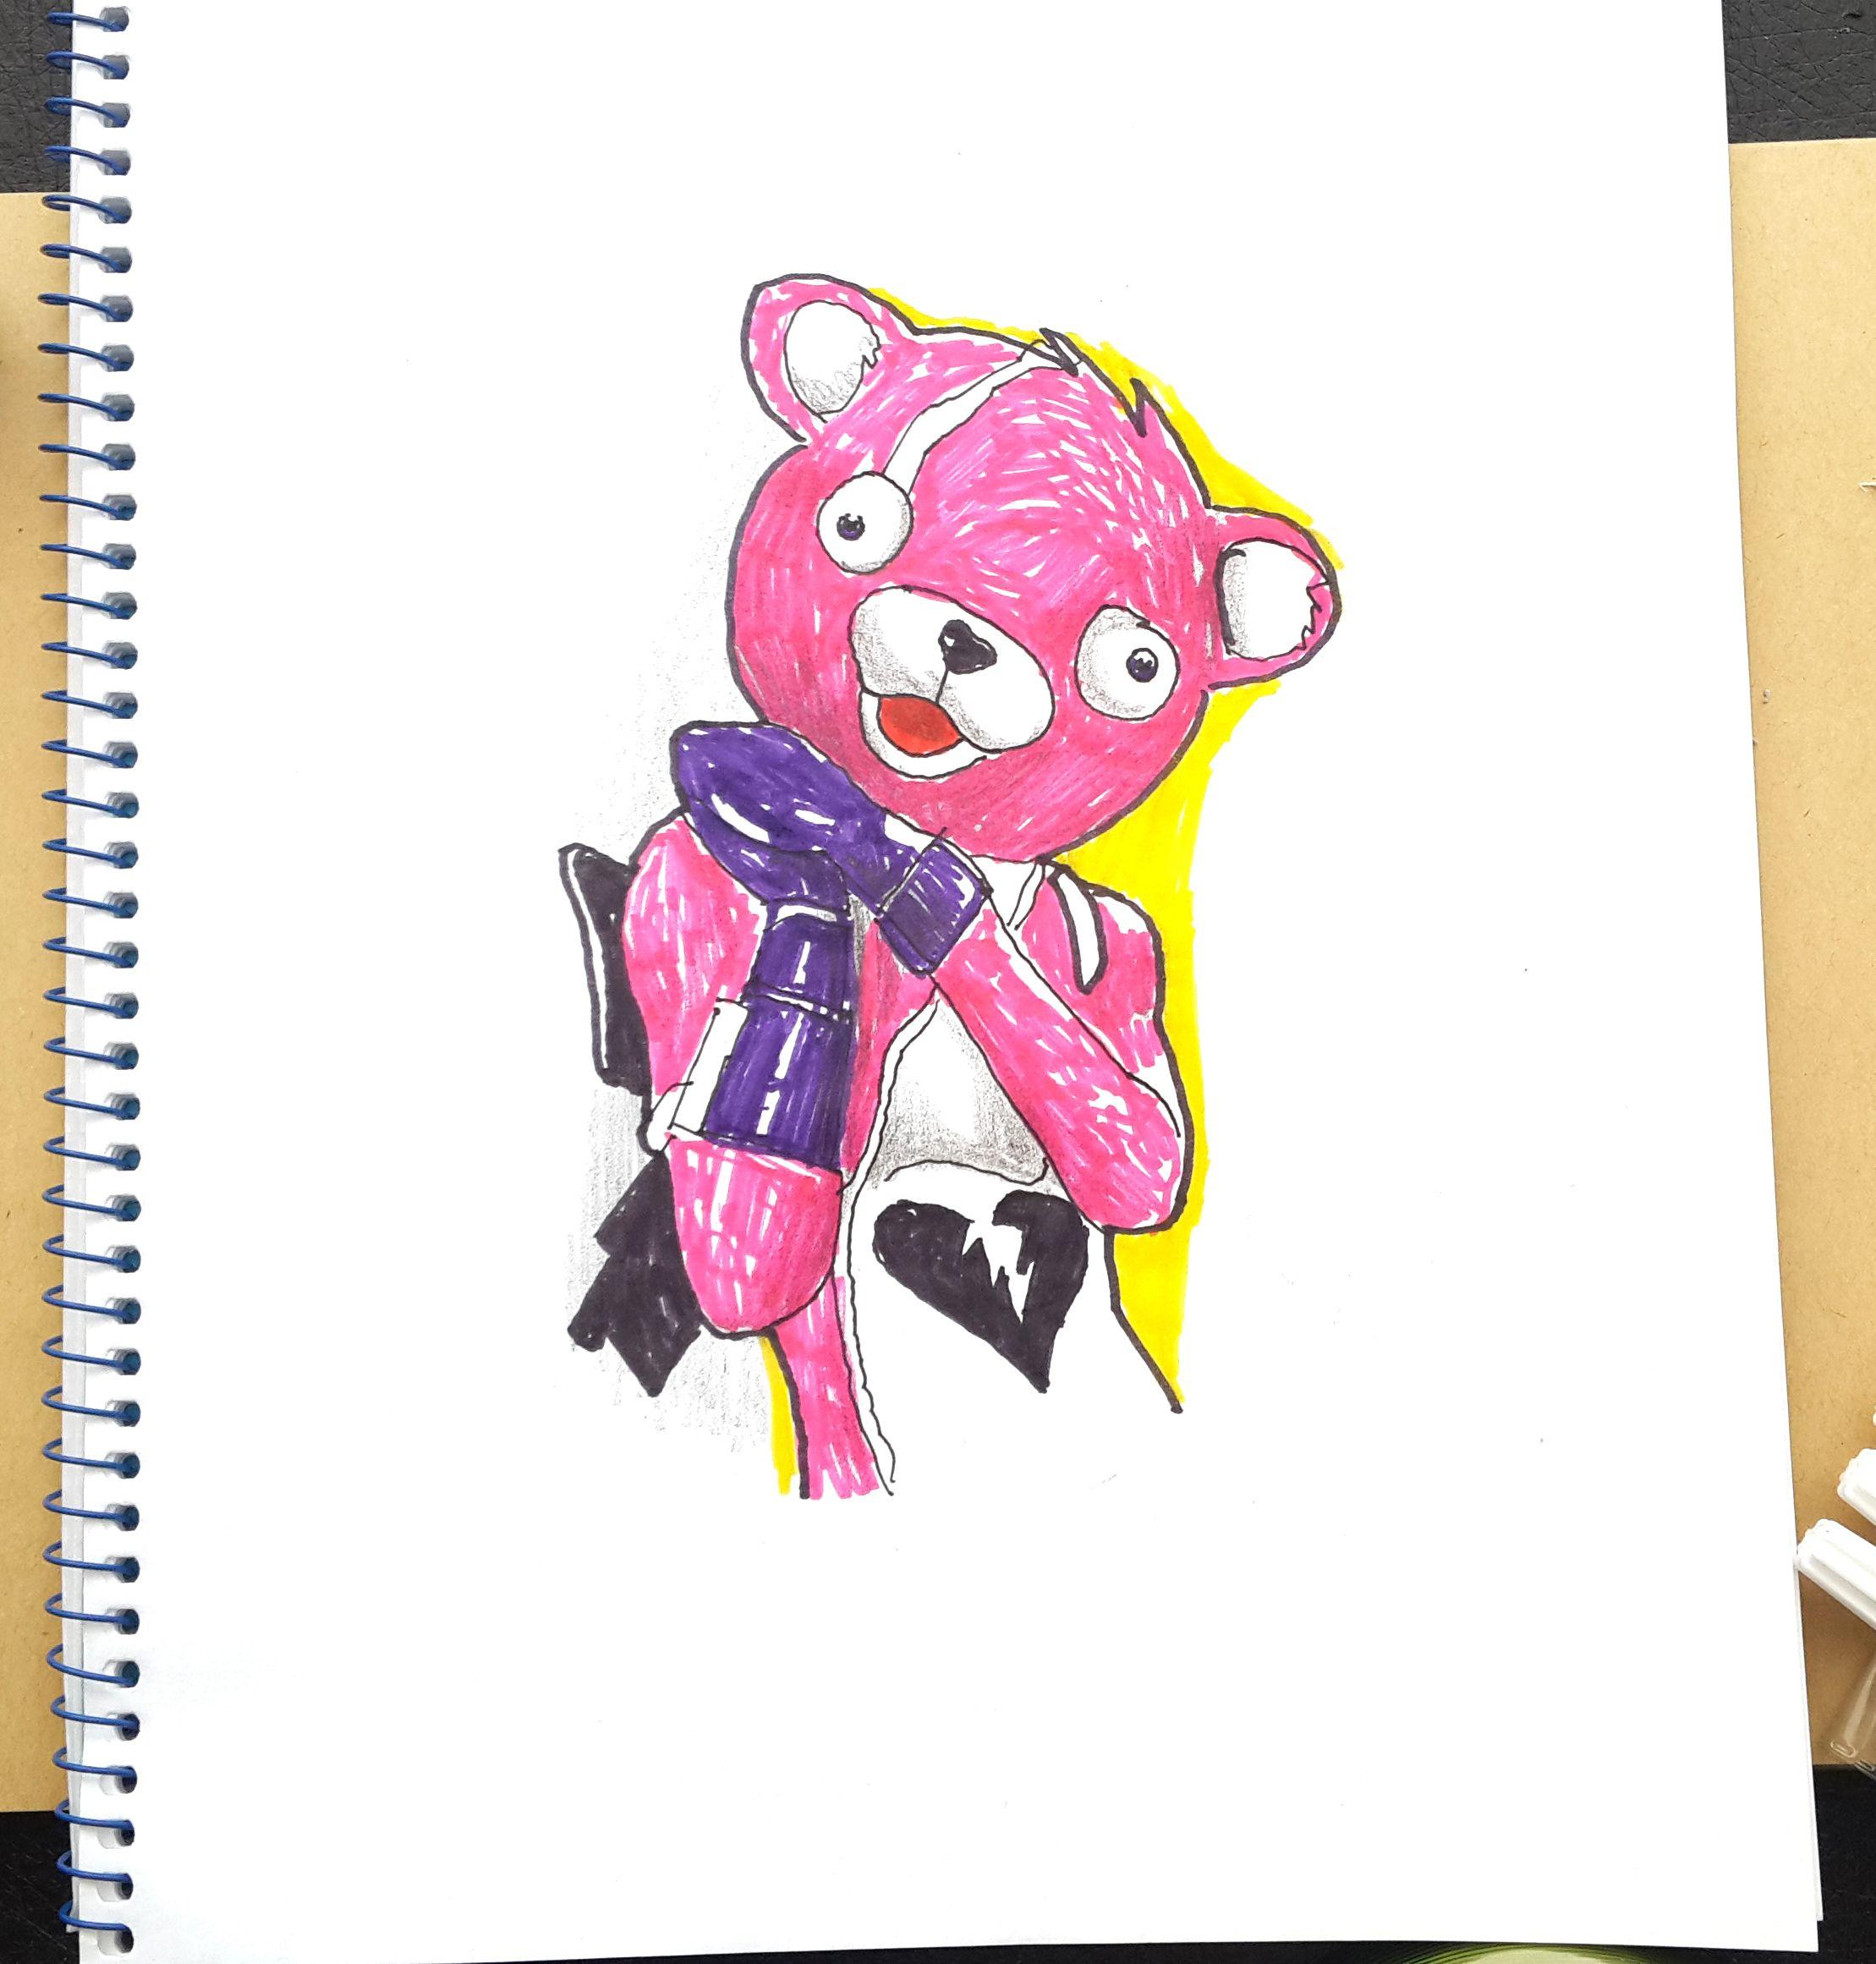 Fortnite Drawings: Pink Bear Fortnite How To Draw